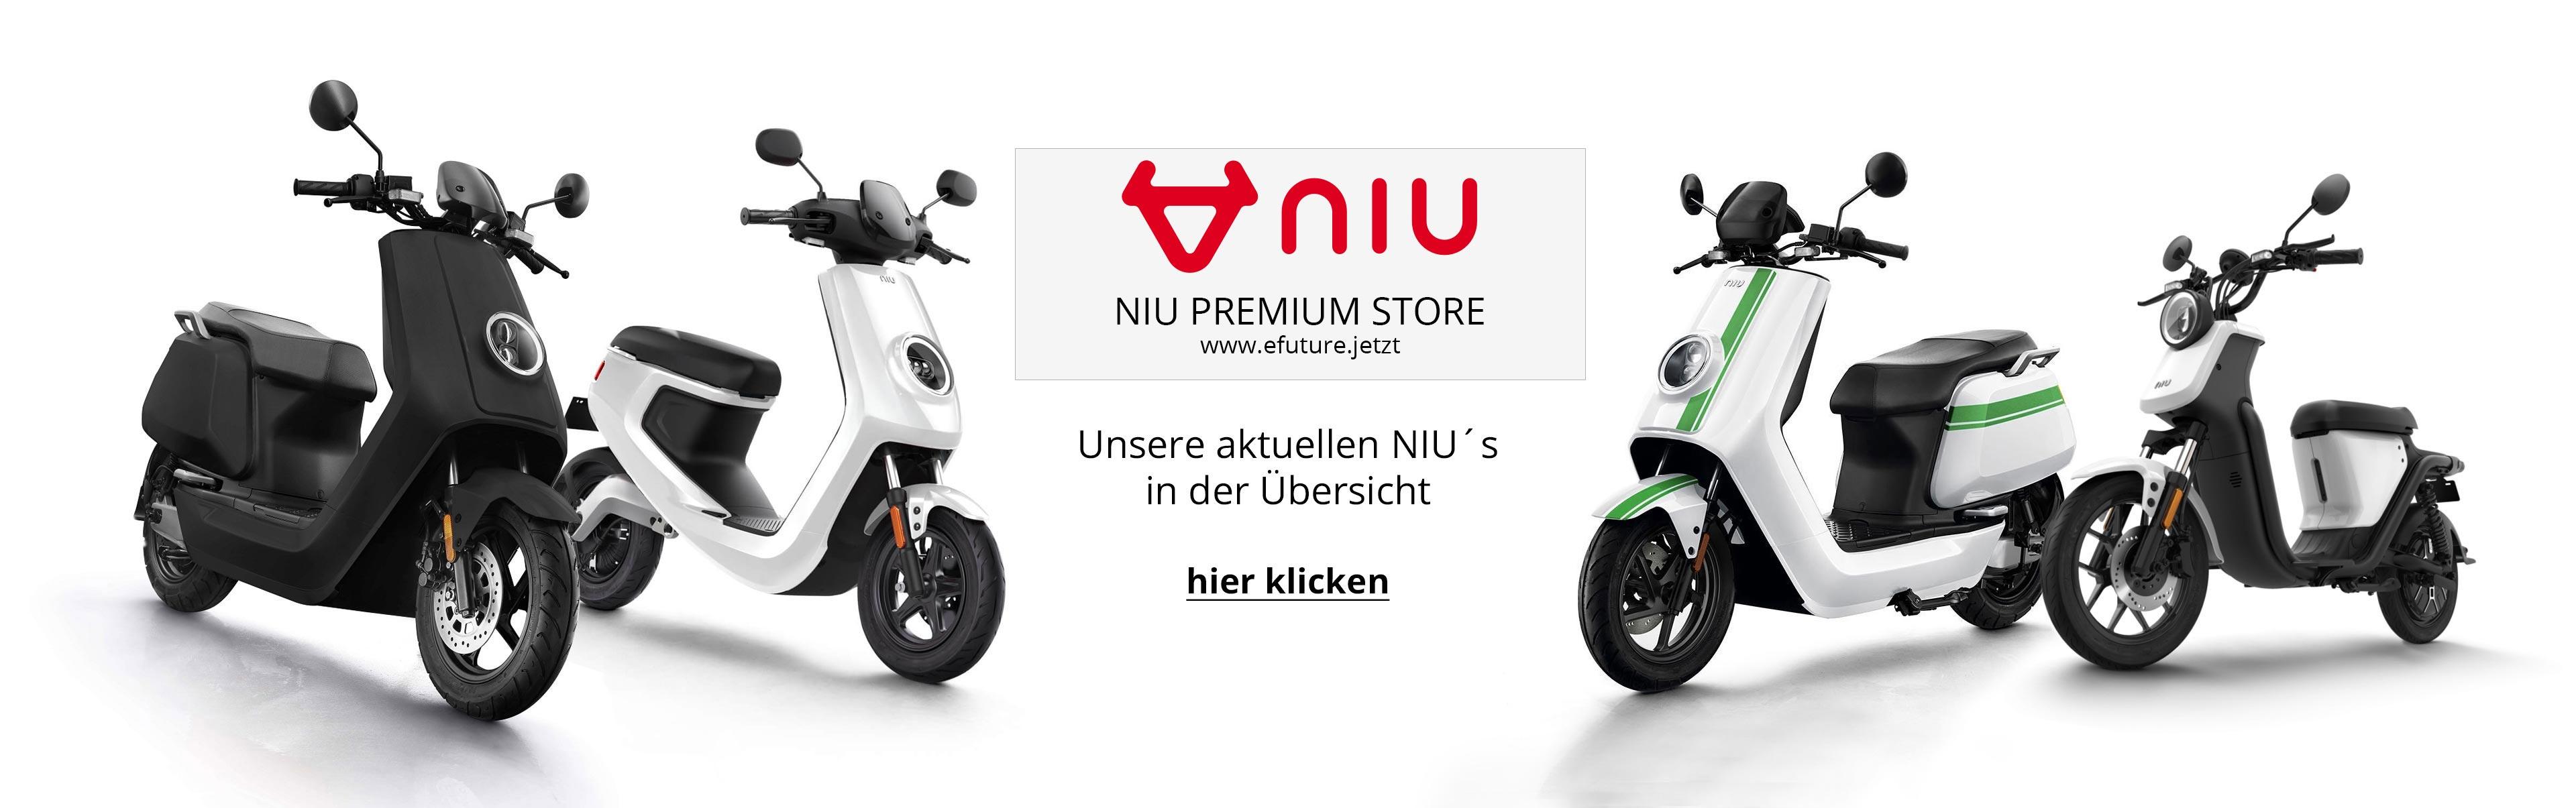 niu_logo_premium_store_efuture_2020